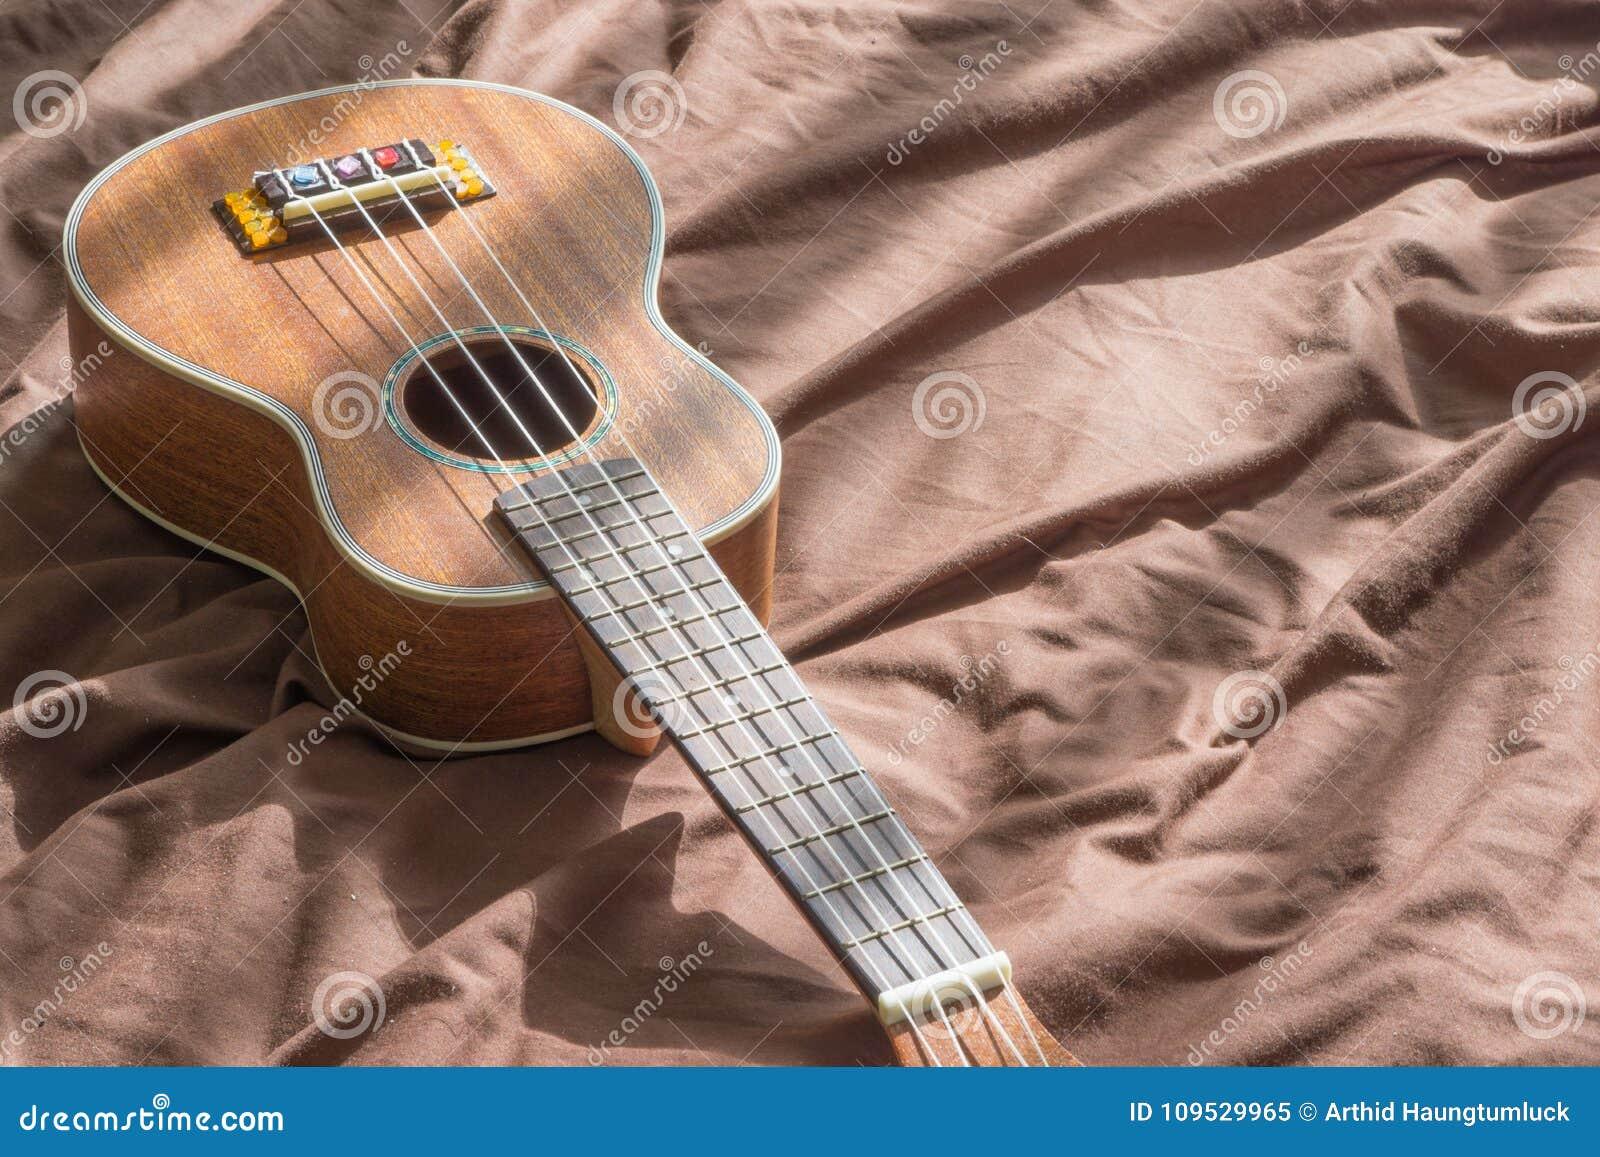 Ukulele Guitar On Bed Background Stock Image Image Of Brown